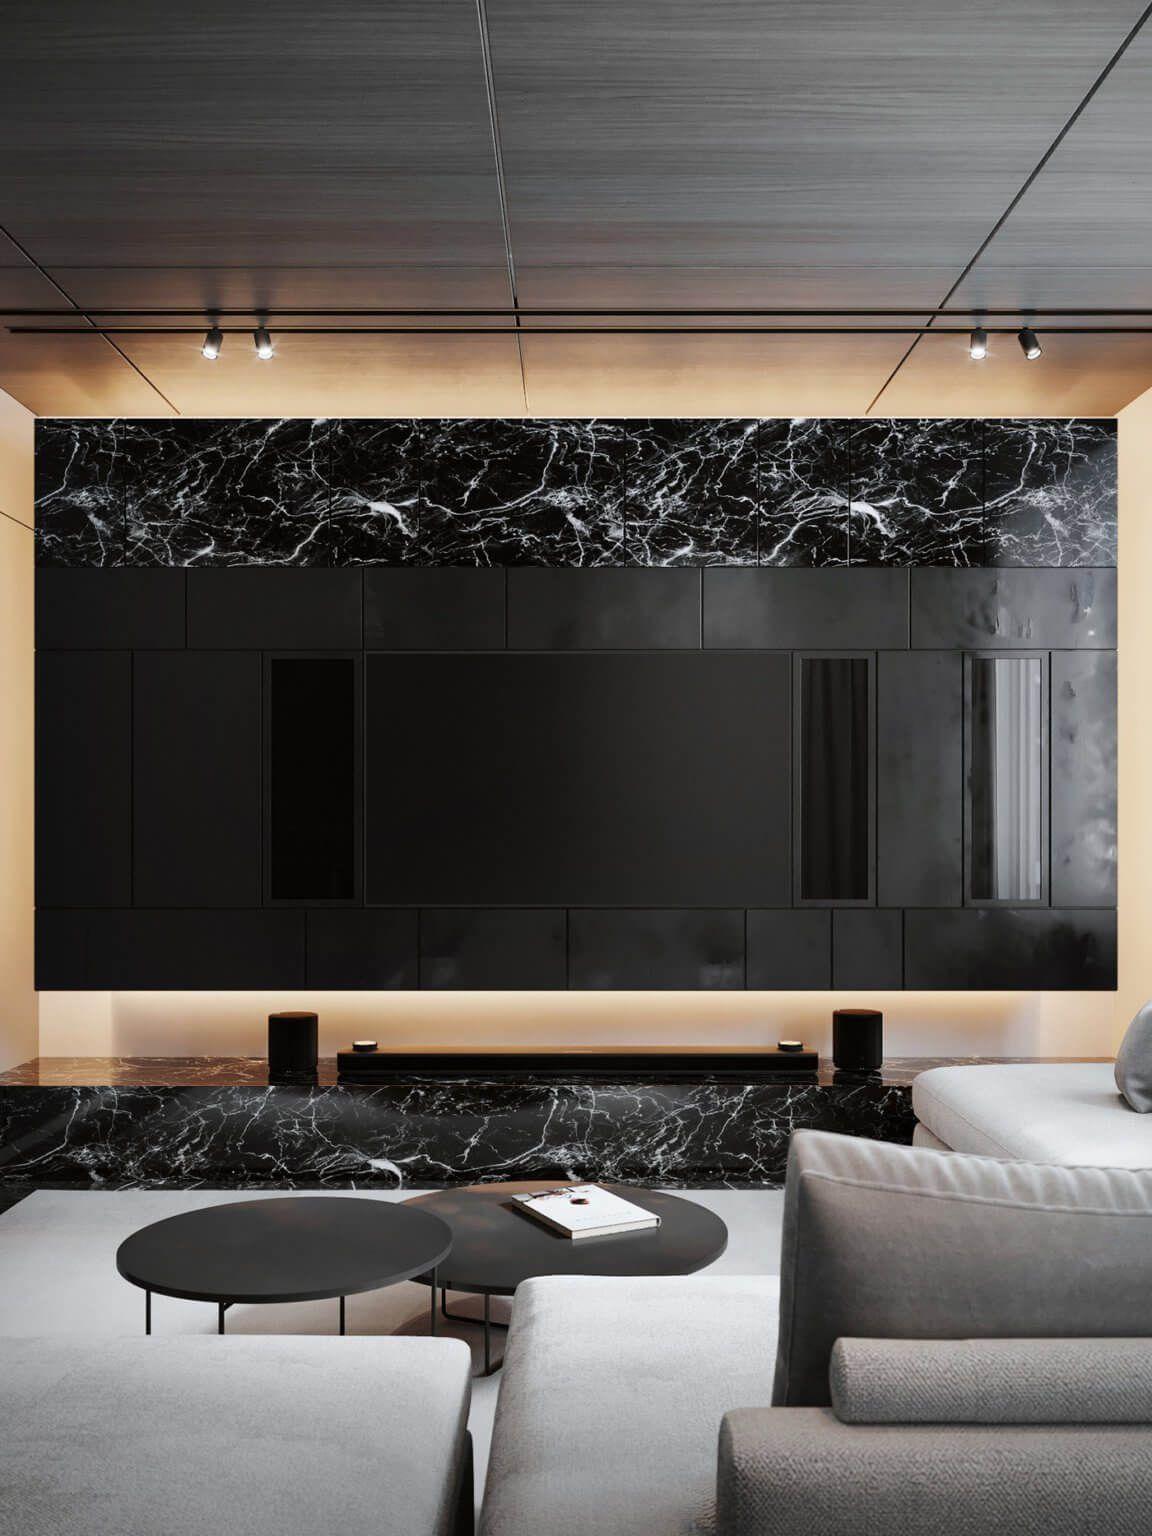 Autodesk Room Design: Pin On Interior S